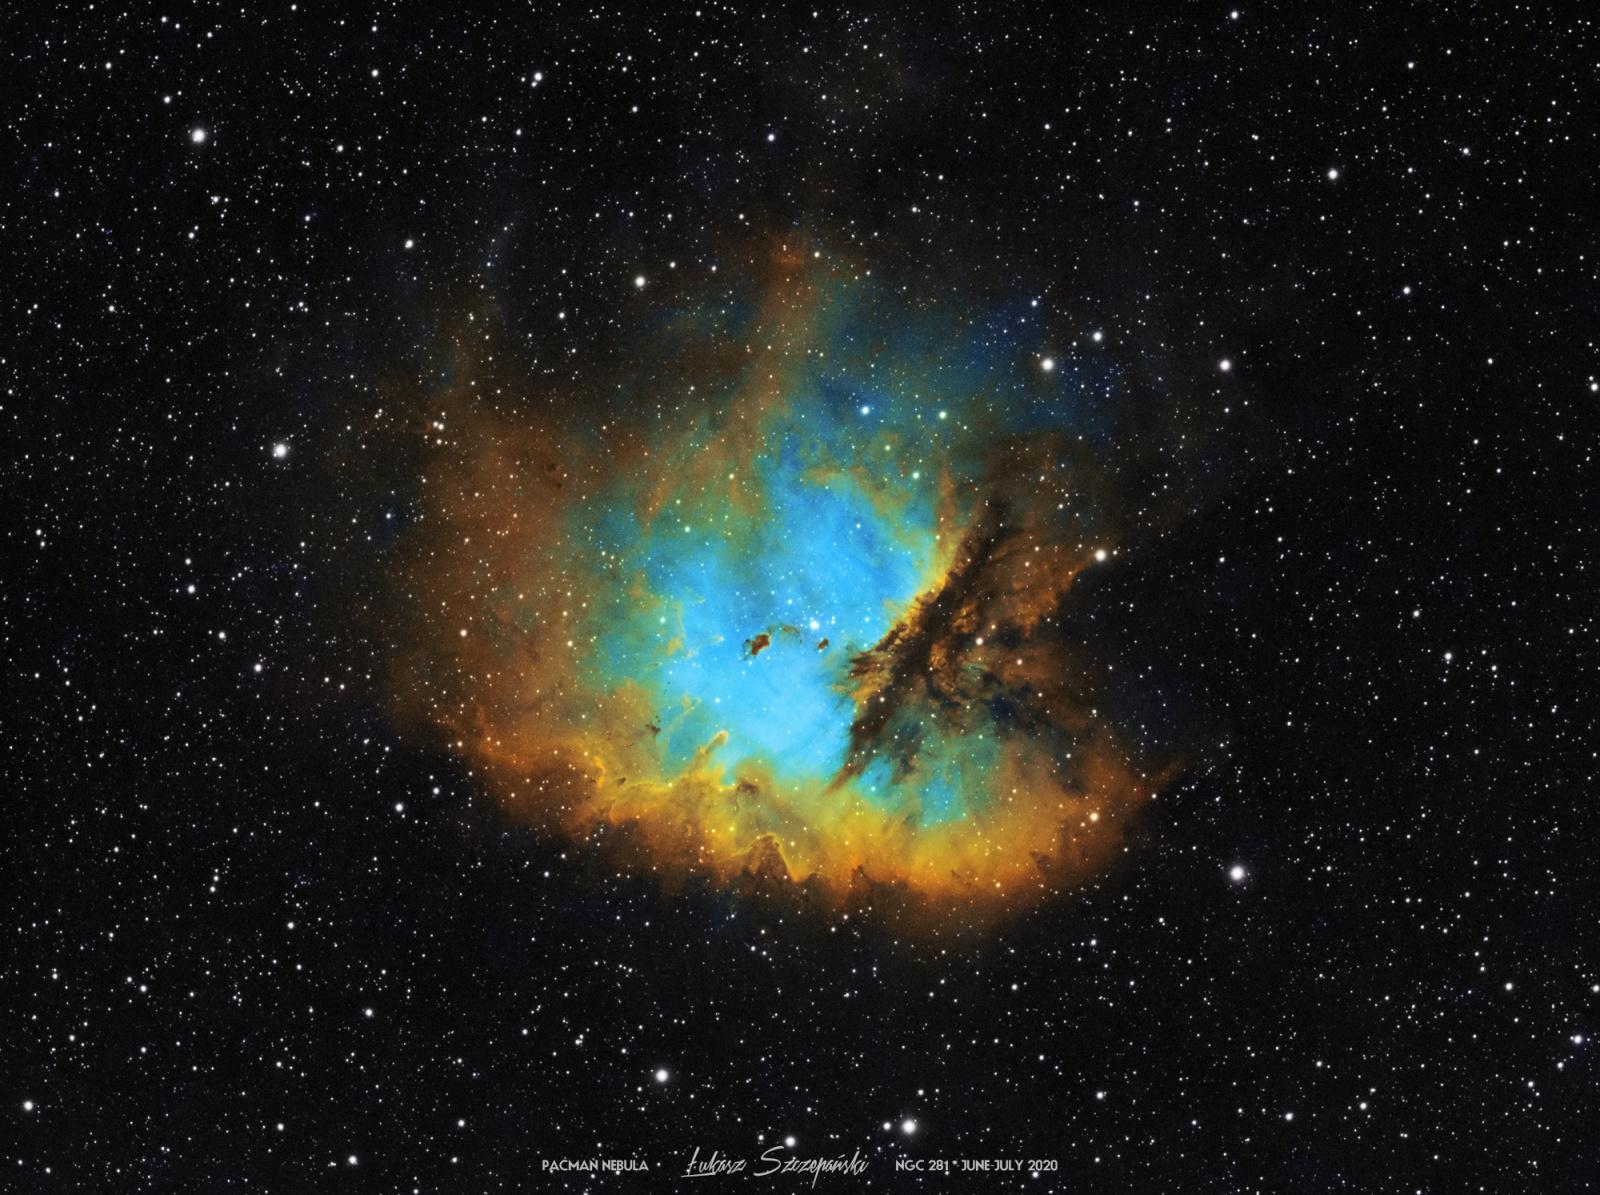 !Final_NGC281_SHO_public_2000px.jpg